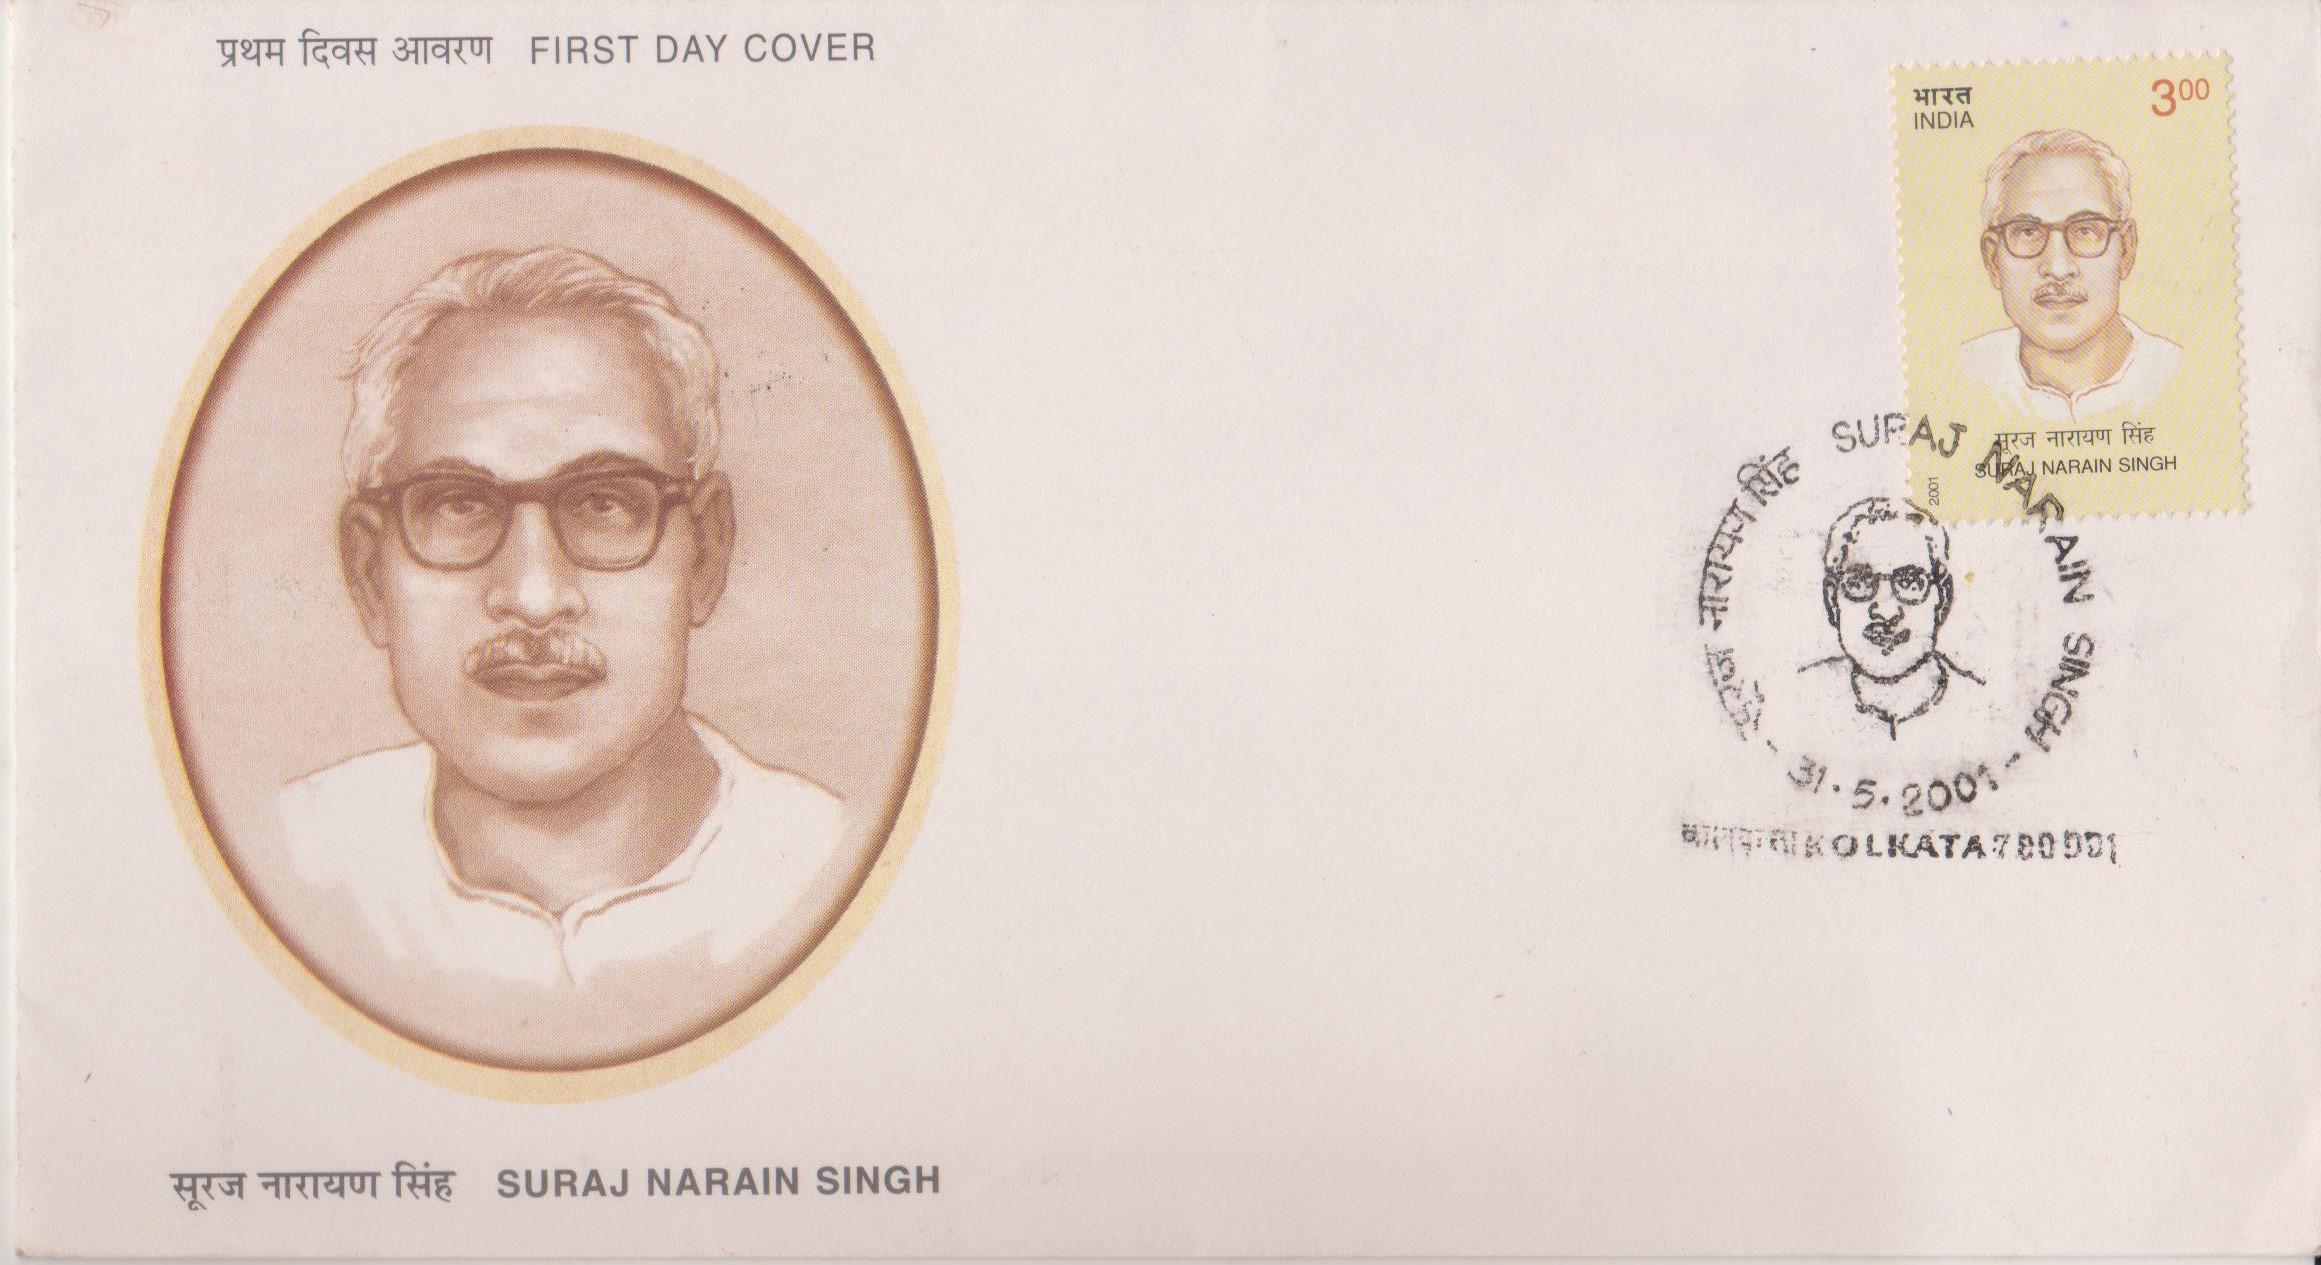 Suraj Narain Singh : Praja Socialist Party